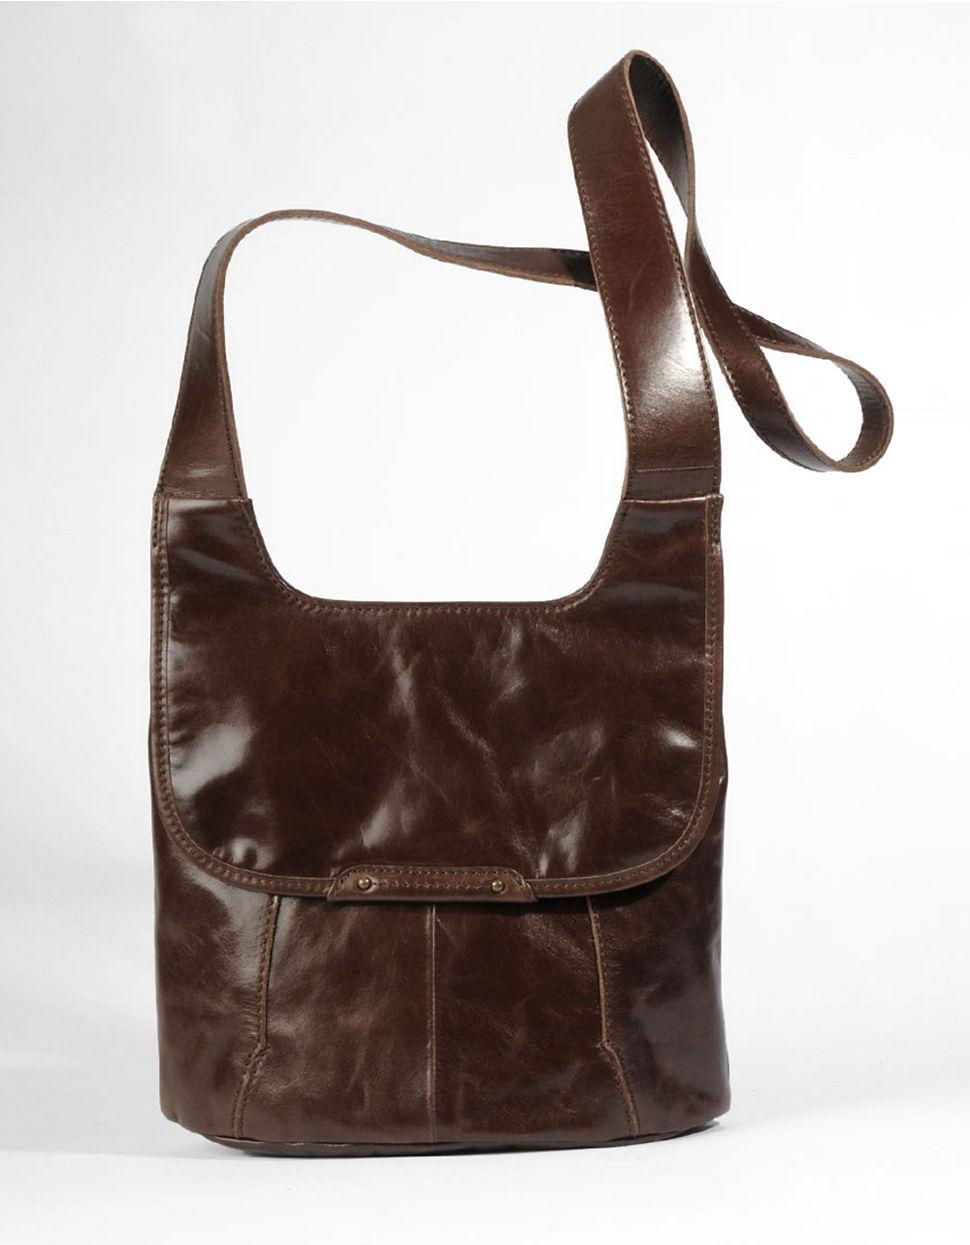 Lyst - Hobo Rockler Leather Crossbody Bag in Brown